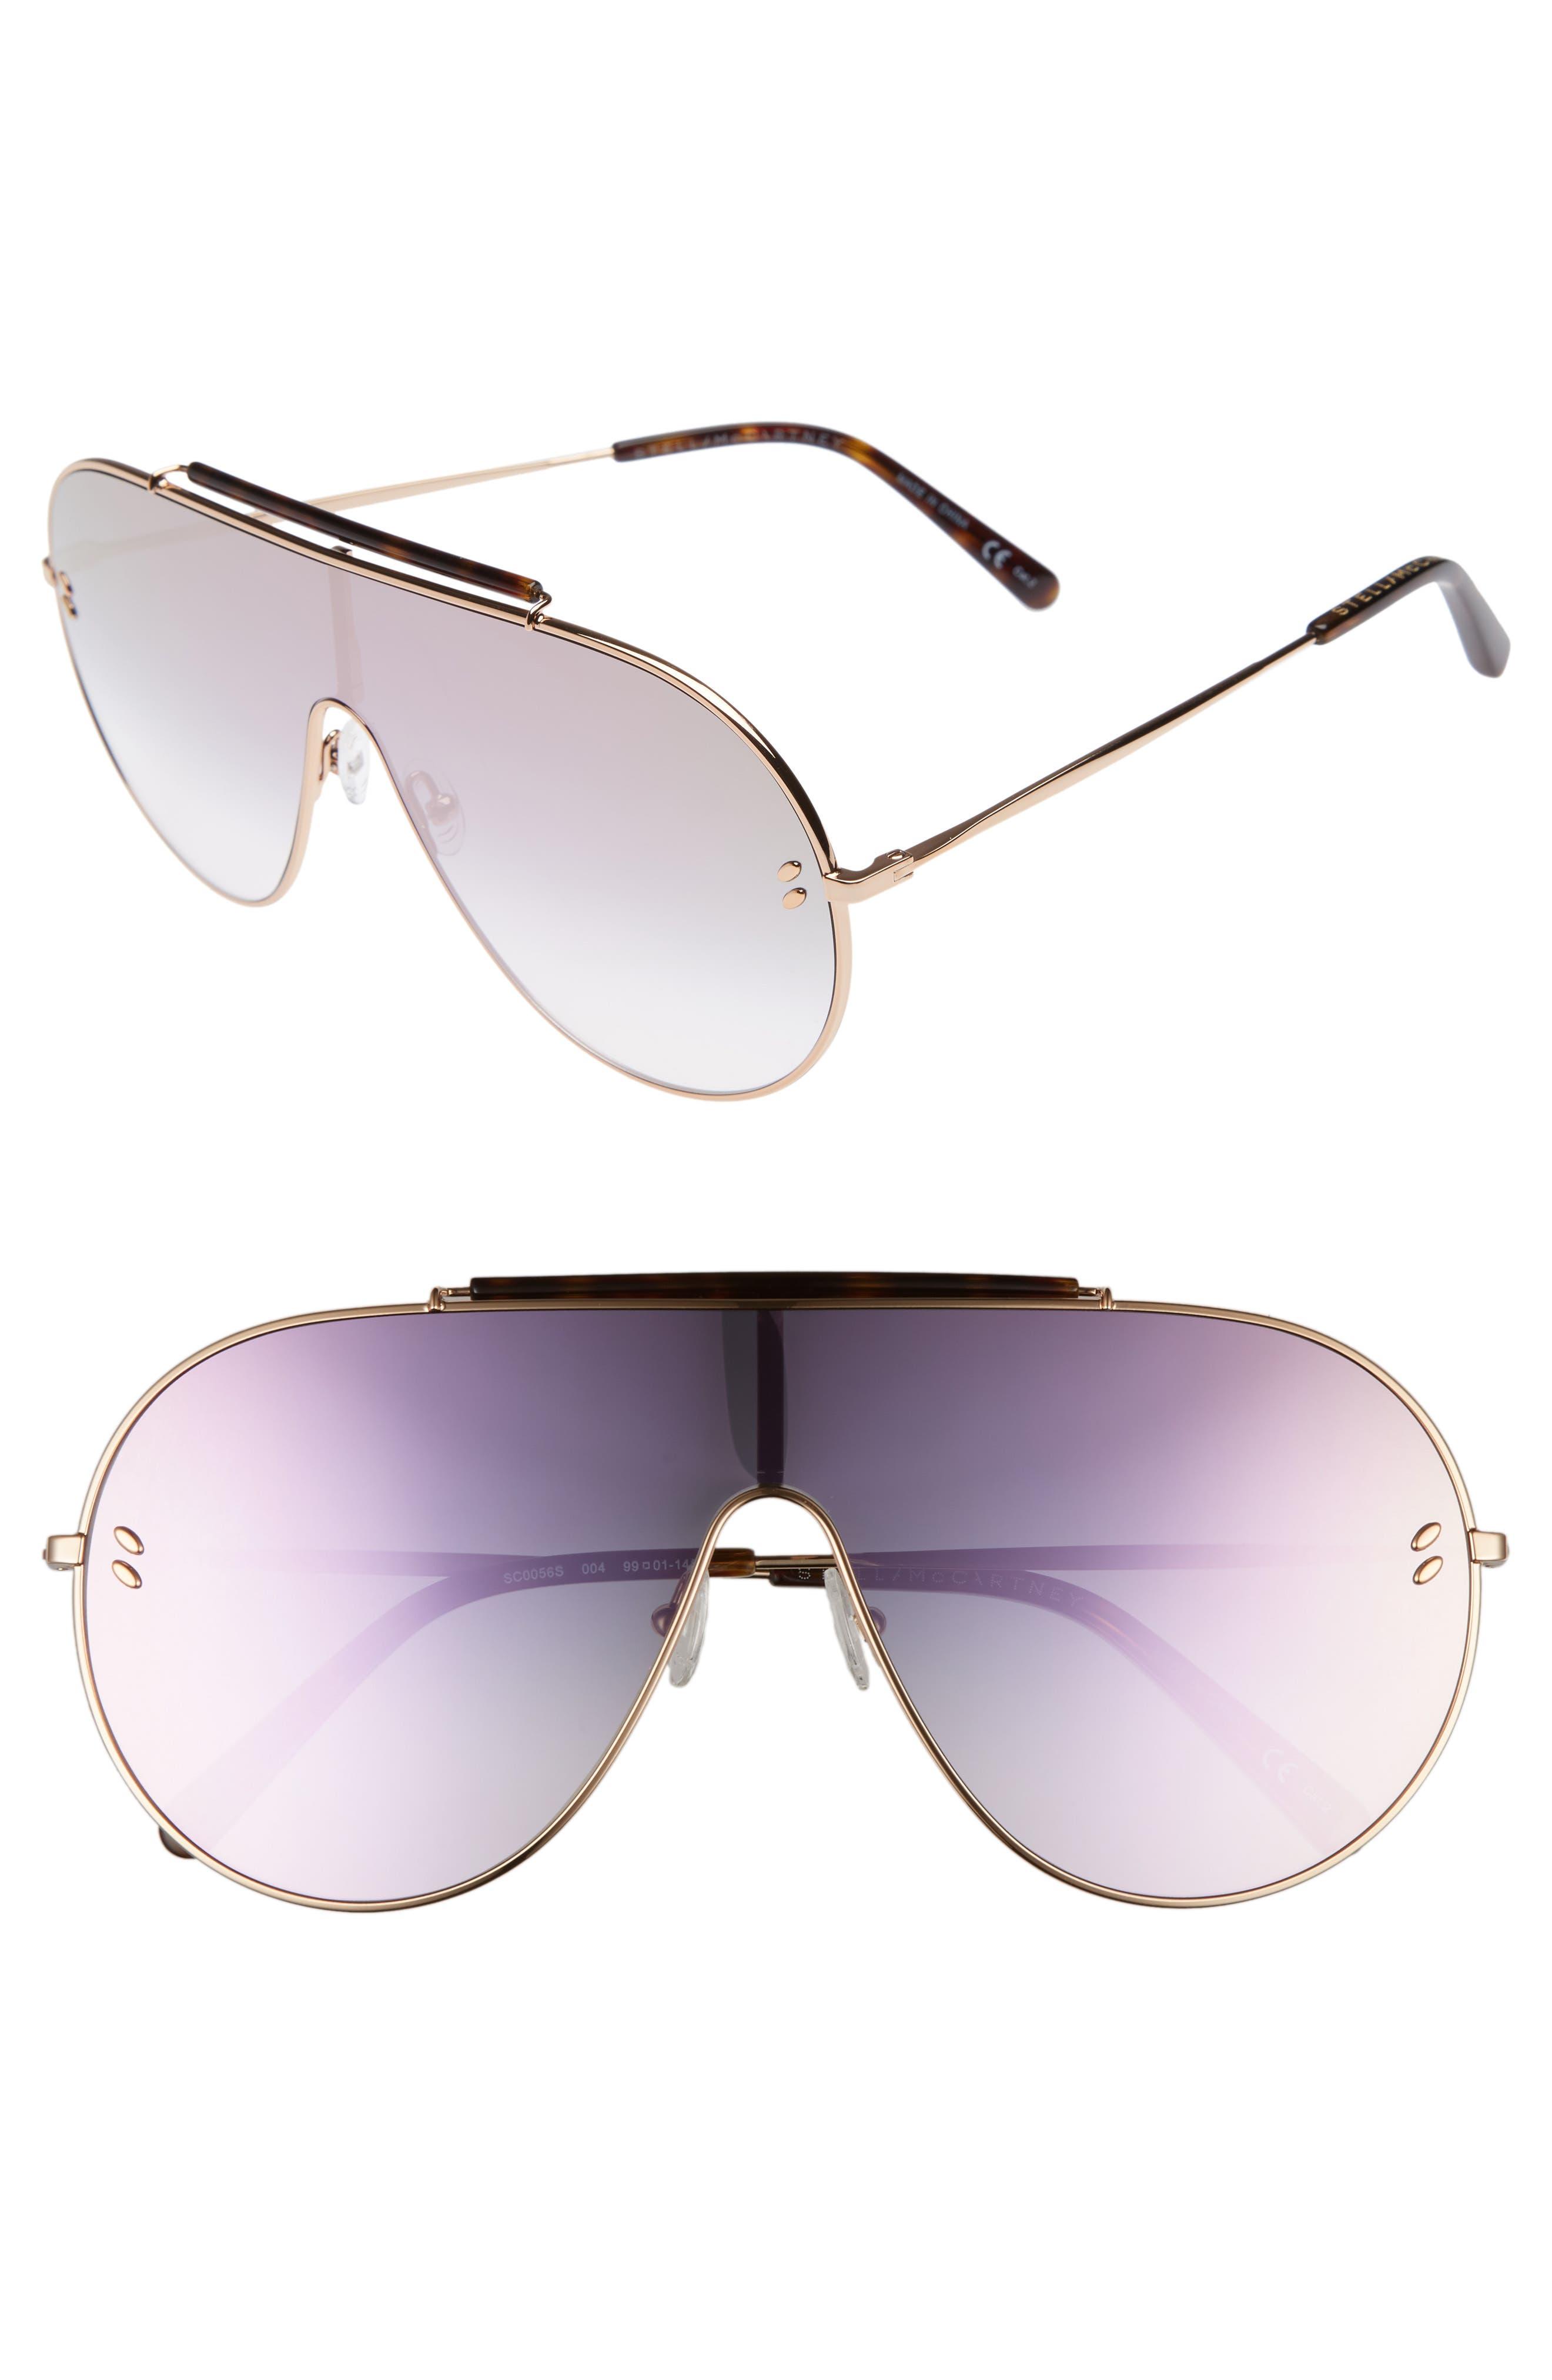 65mm Shield Sunglasses,                             Main thumbnail 2, color,